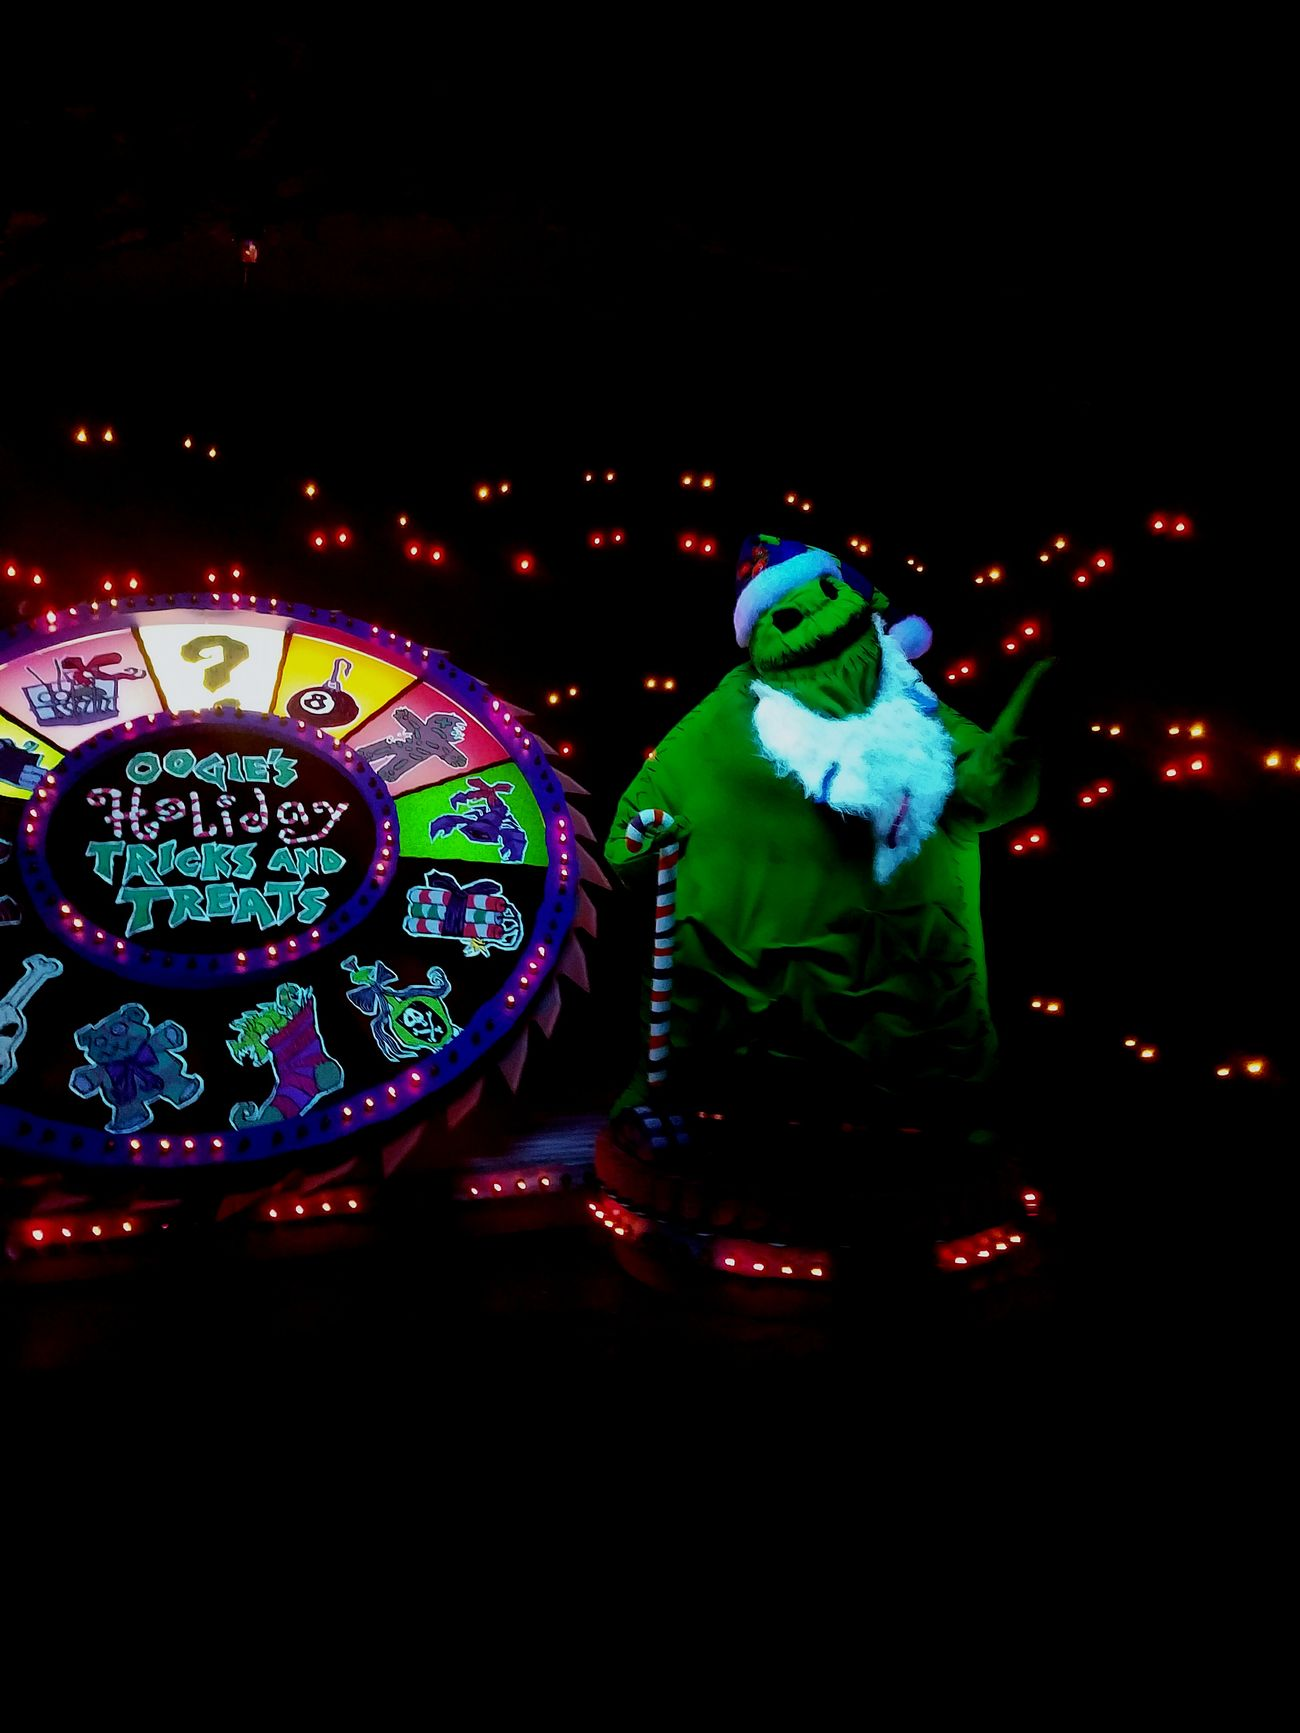 Illuminated Dark Neon Anaheim Attraction Ride JackSkellington Nightmarebeforechristmas Hauntedmansion Haunted Mansion Timburton Disney Disneyland Spooky Halloween Oogieboogie Boogieman Disneylandresort Disneylandphotography